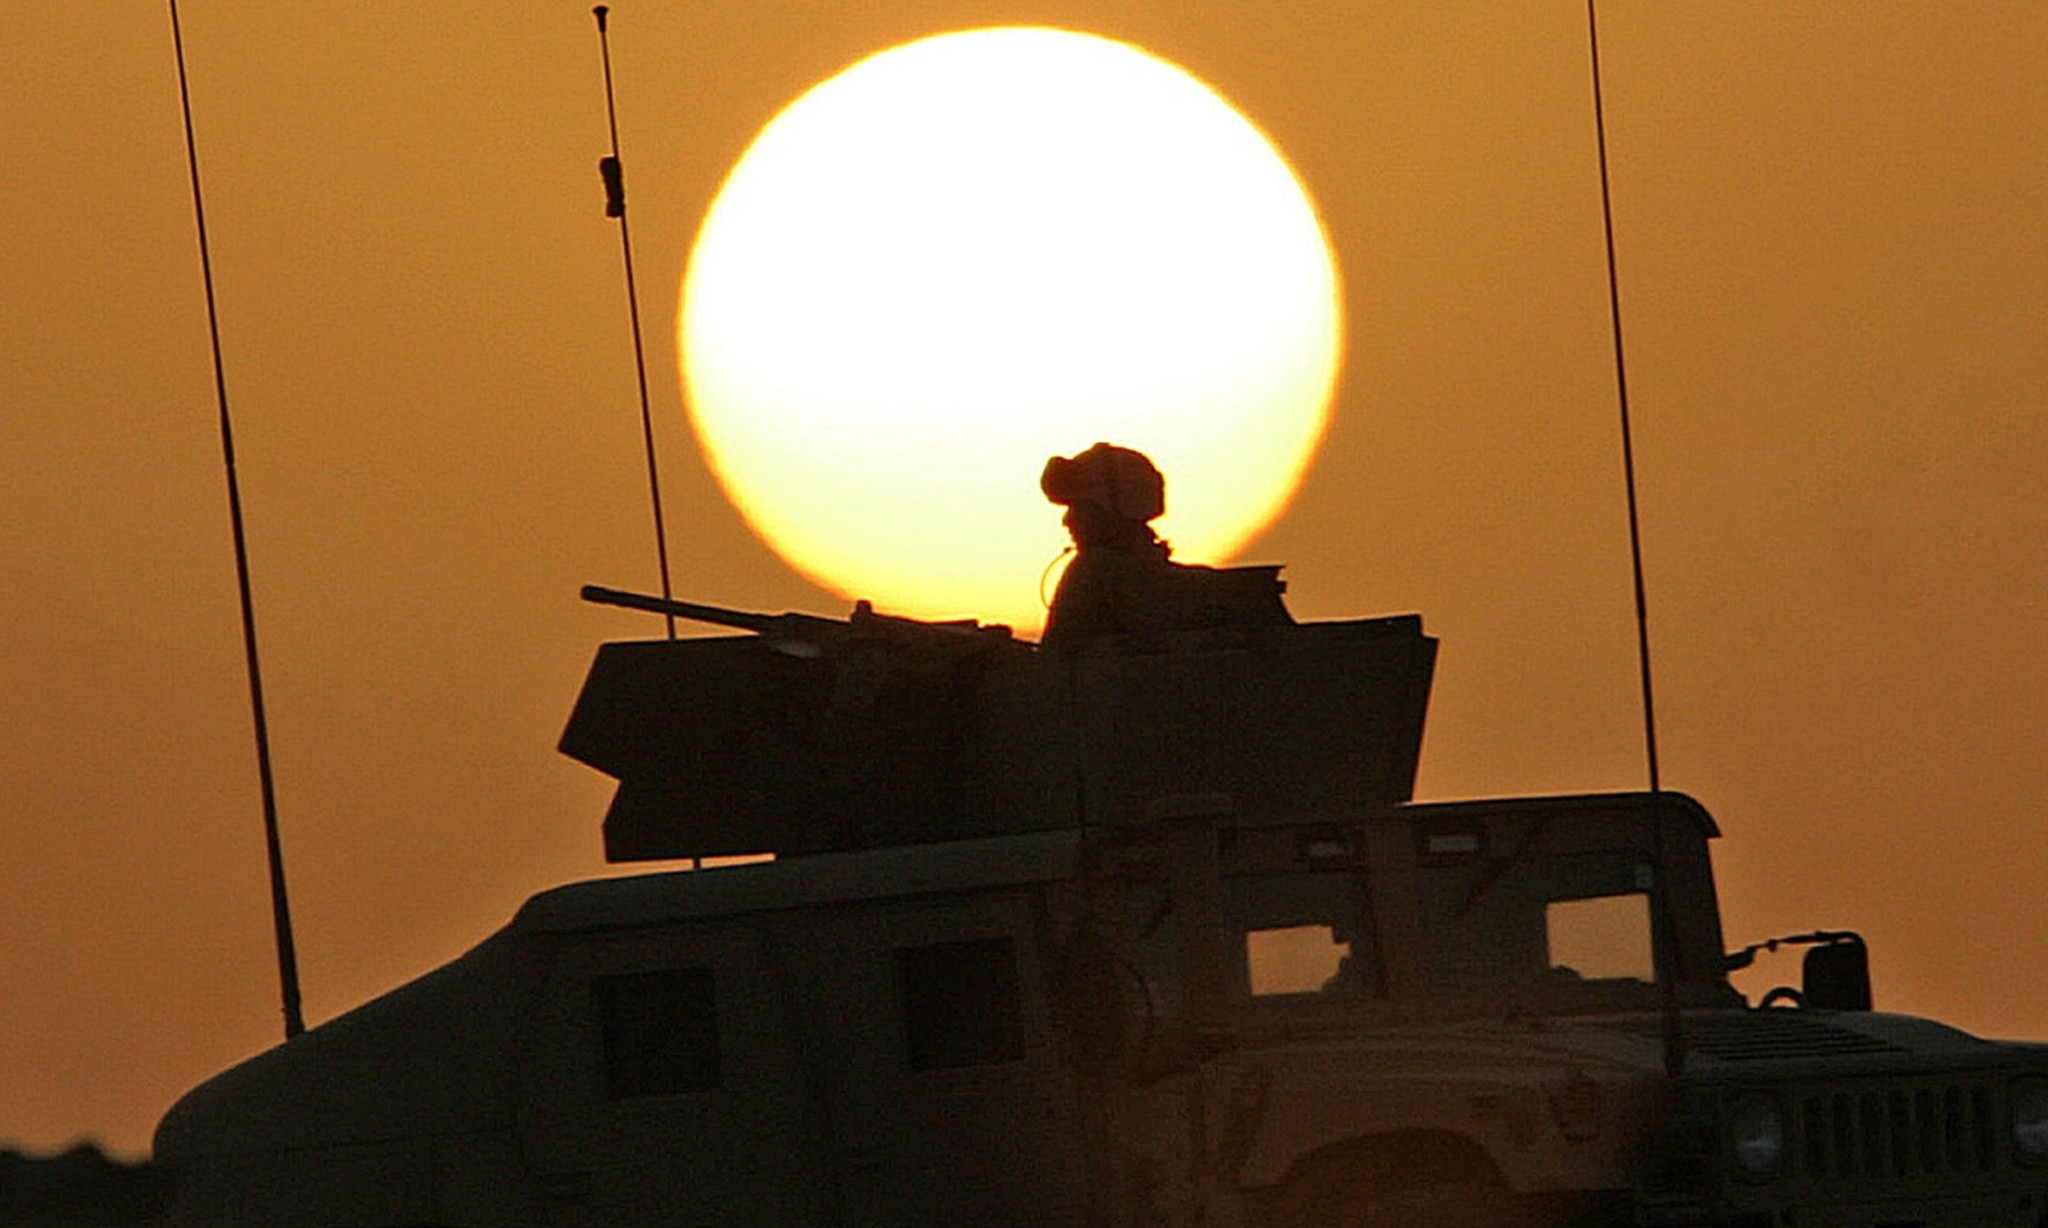 Sun sets on era of the Humvee as US military announces successor